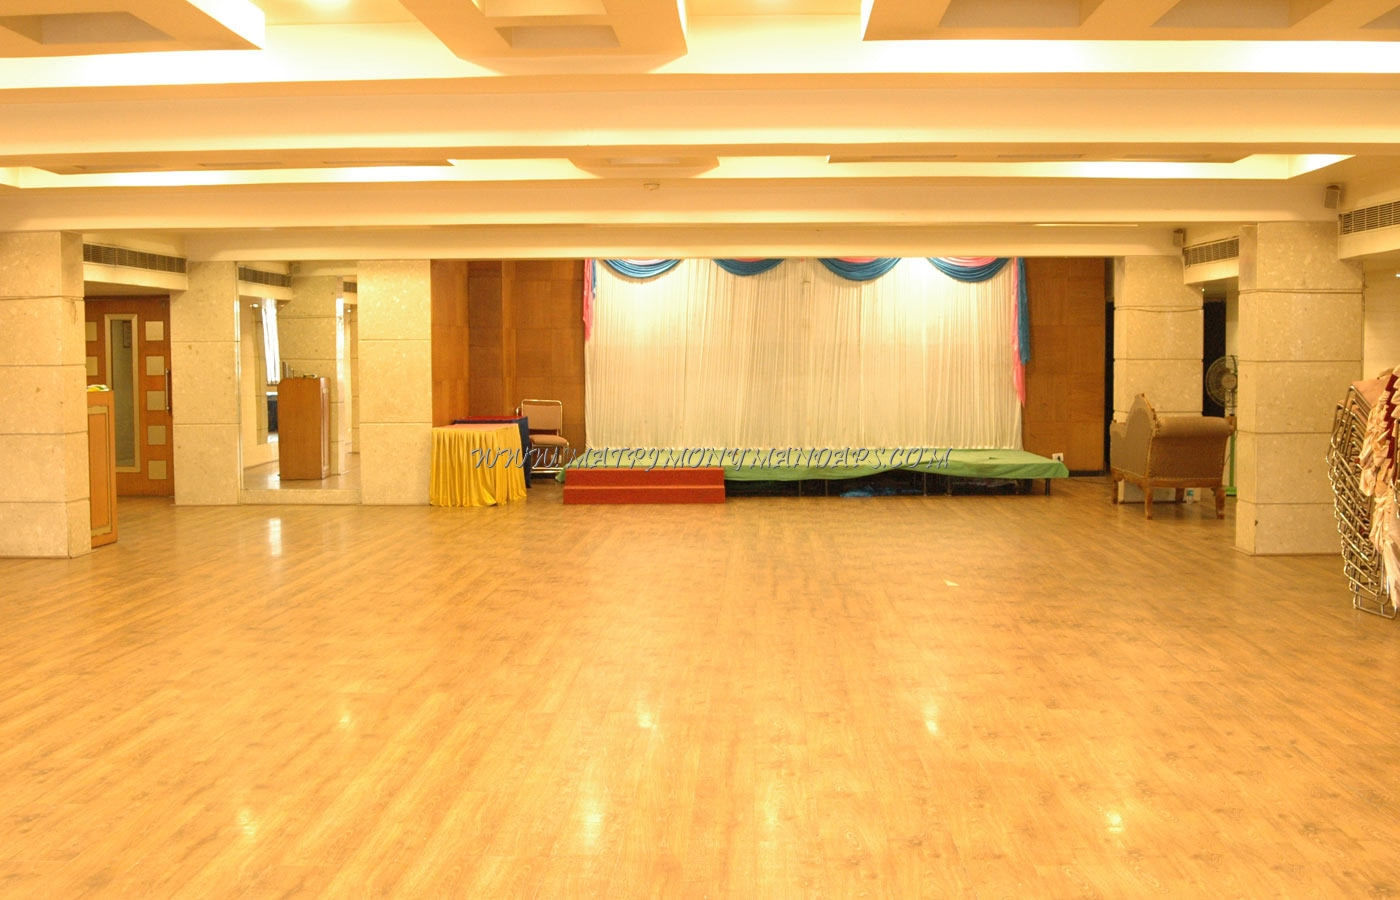 Chutneys Banquet Hall 1 - Pre-function Area